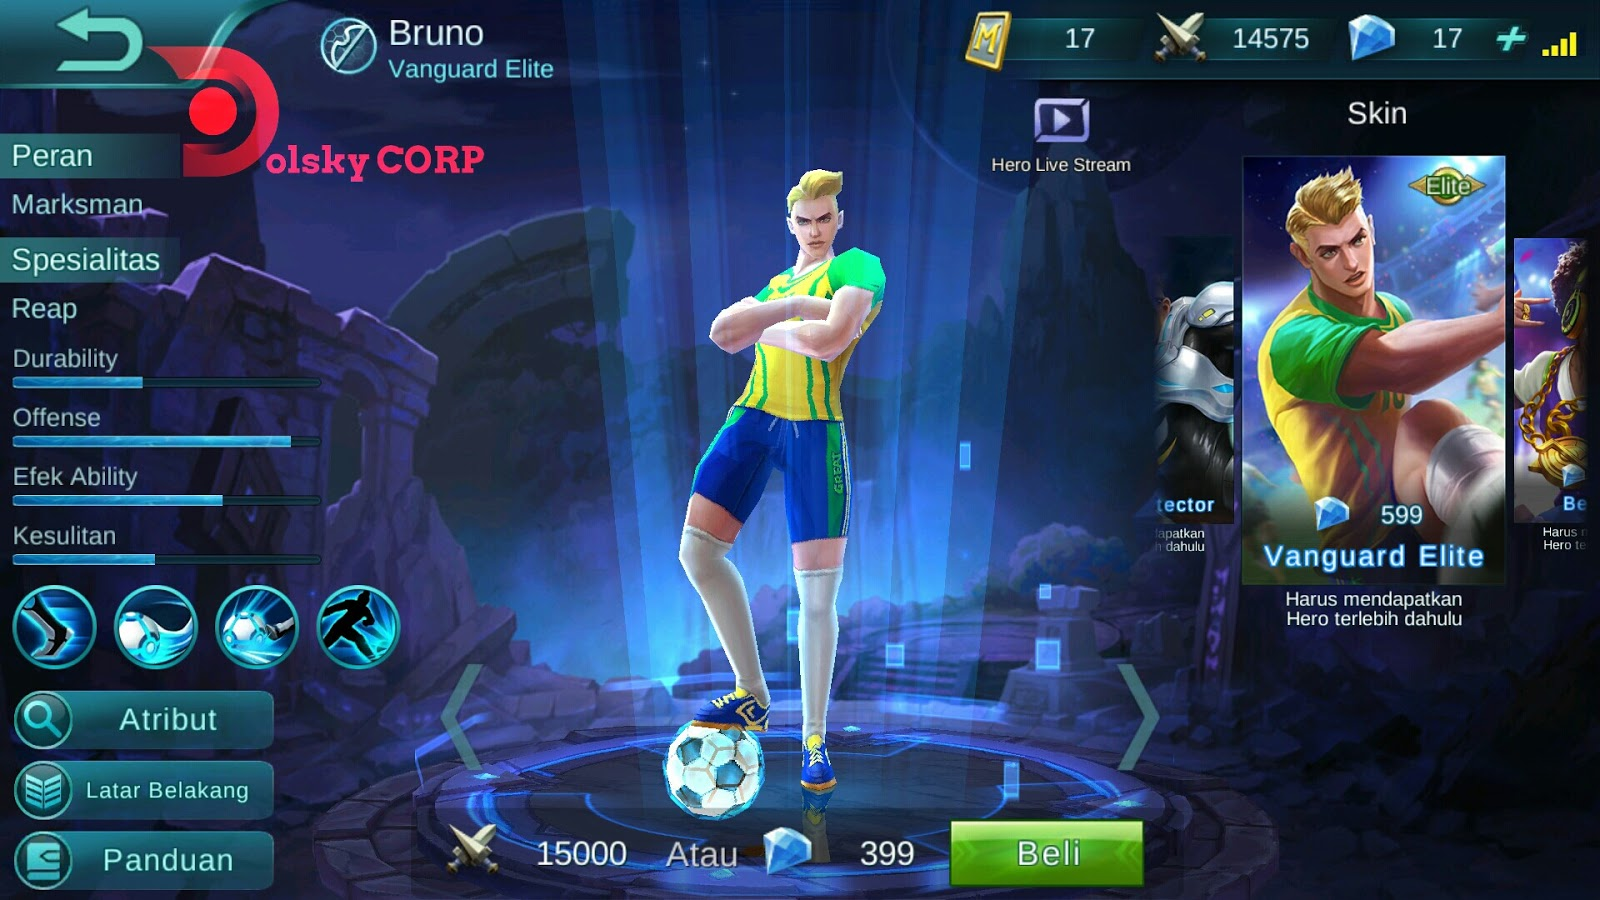 Hero Bruno ( Vanguard Elite ) High Attack Build Set Up